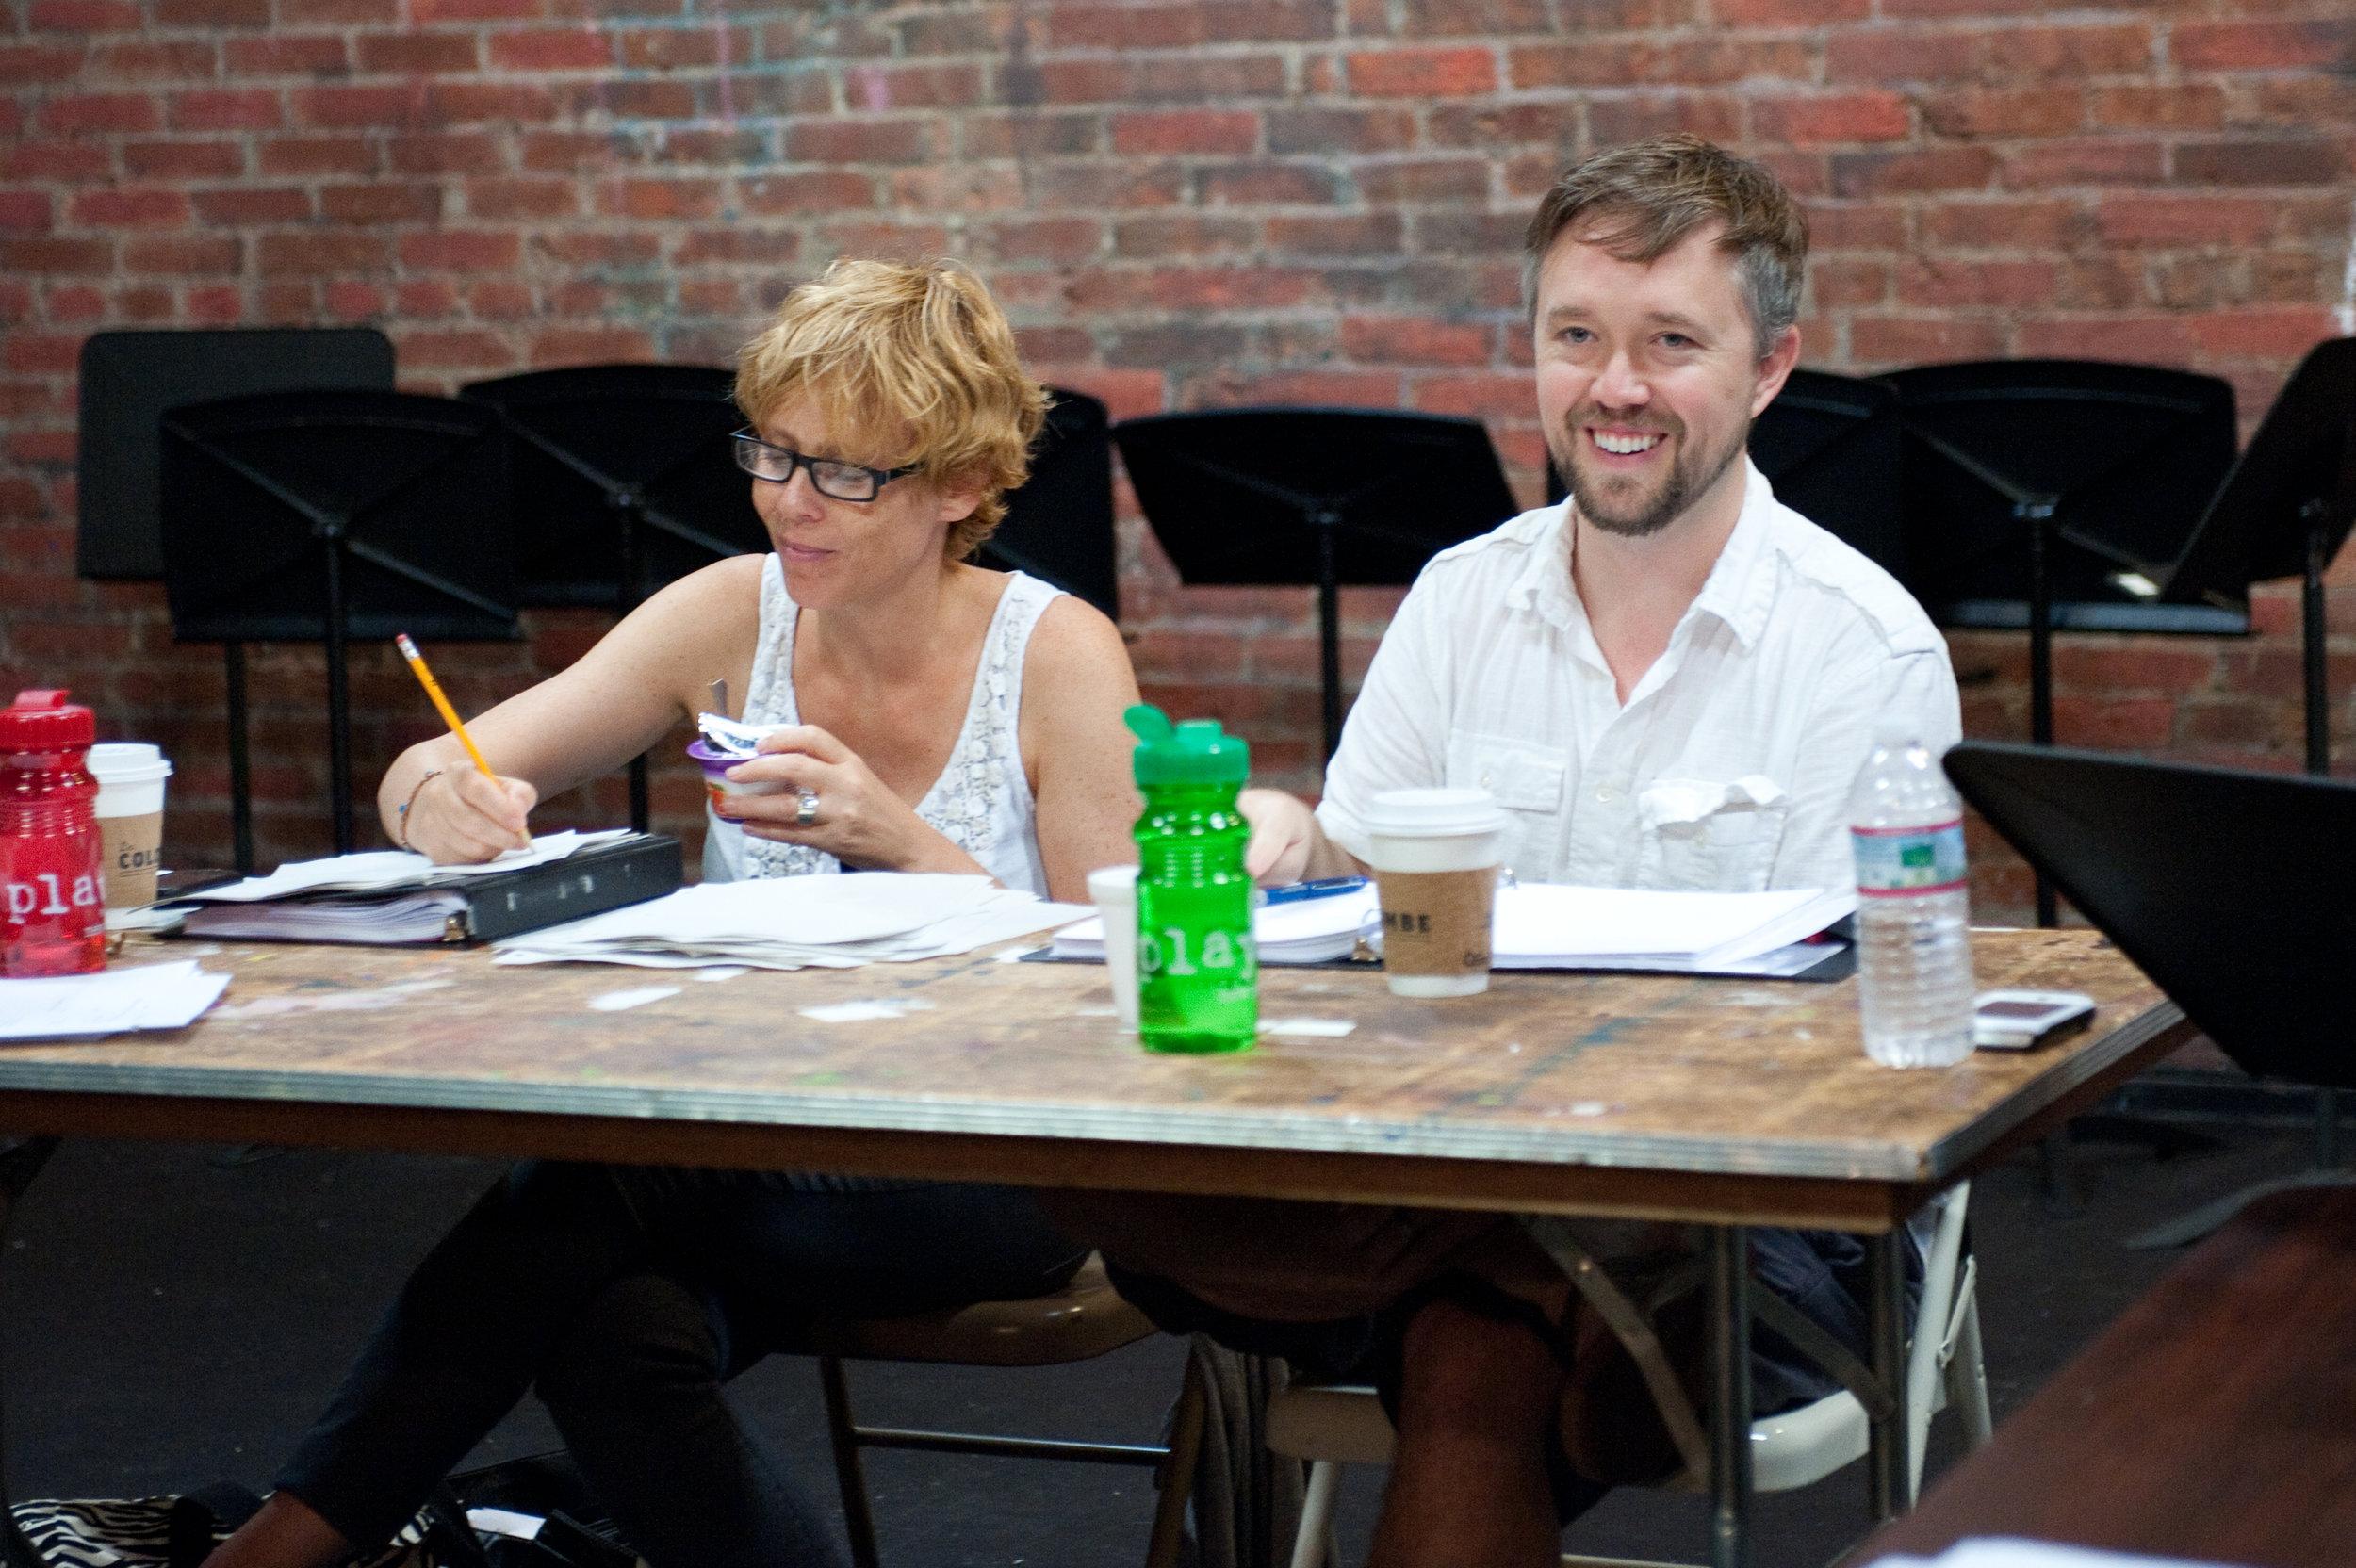 Director Lucie Tiberghien & Gabriel Jason Dean at PlayPenn 2013.